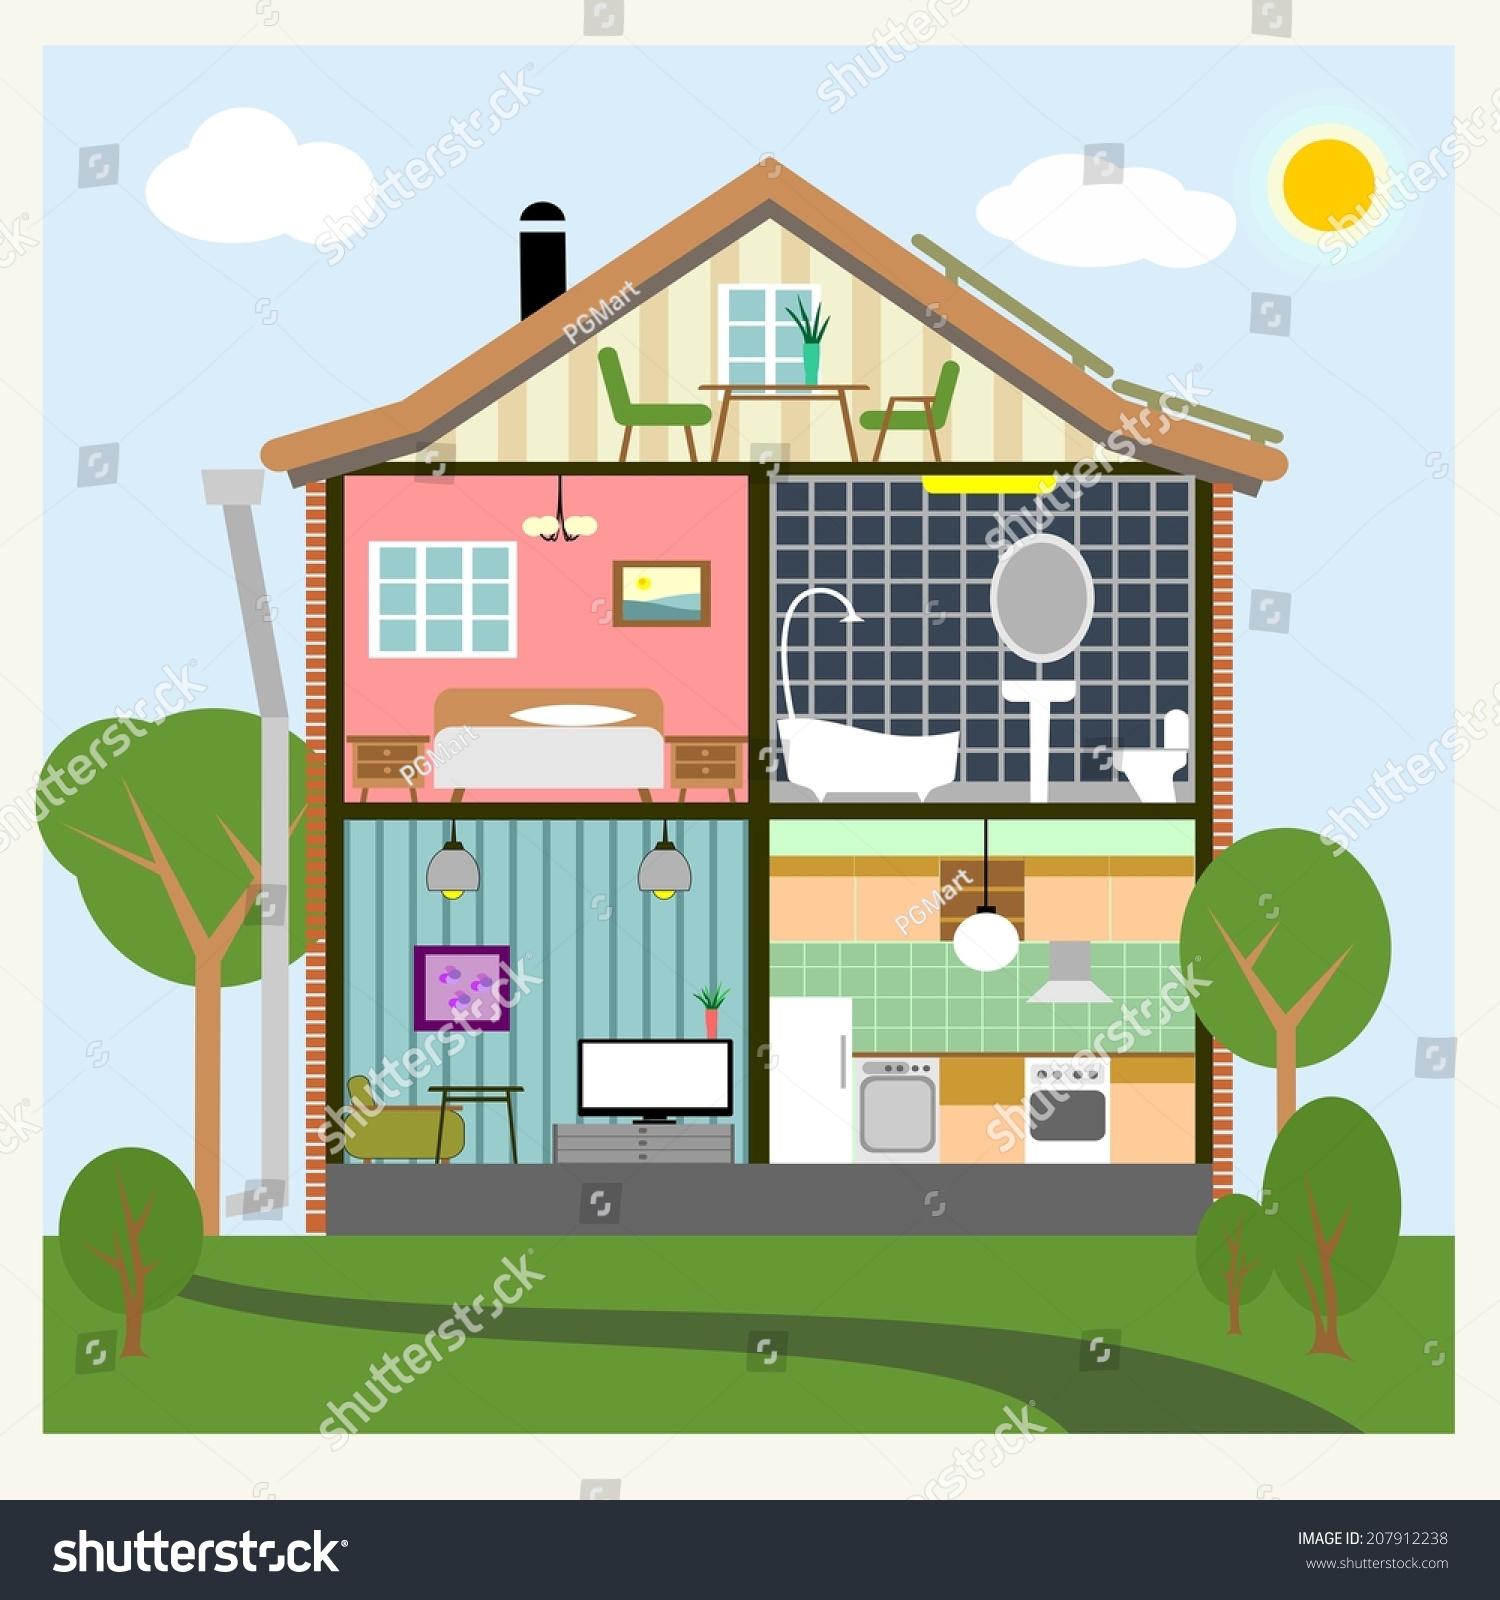 Vector Background House Interiors Living Kitchen Stock Vector 207912238 Shutterstock